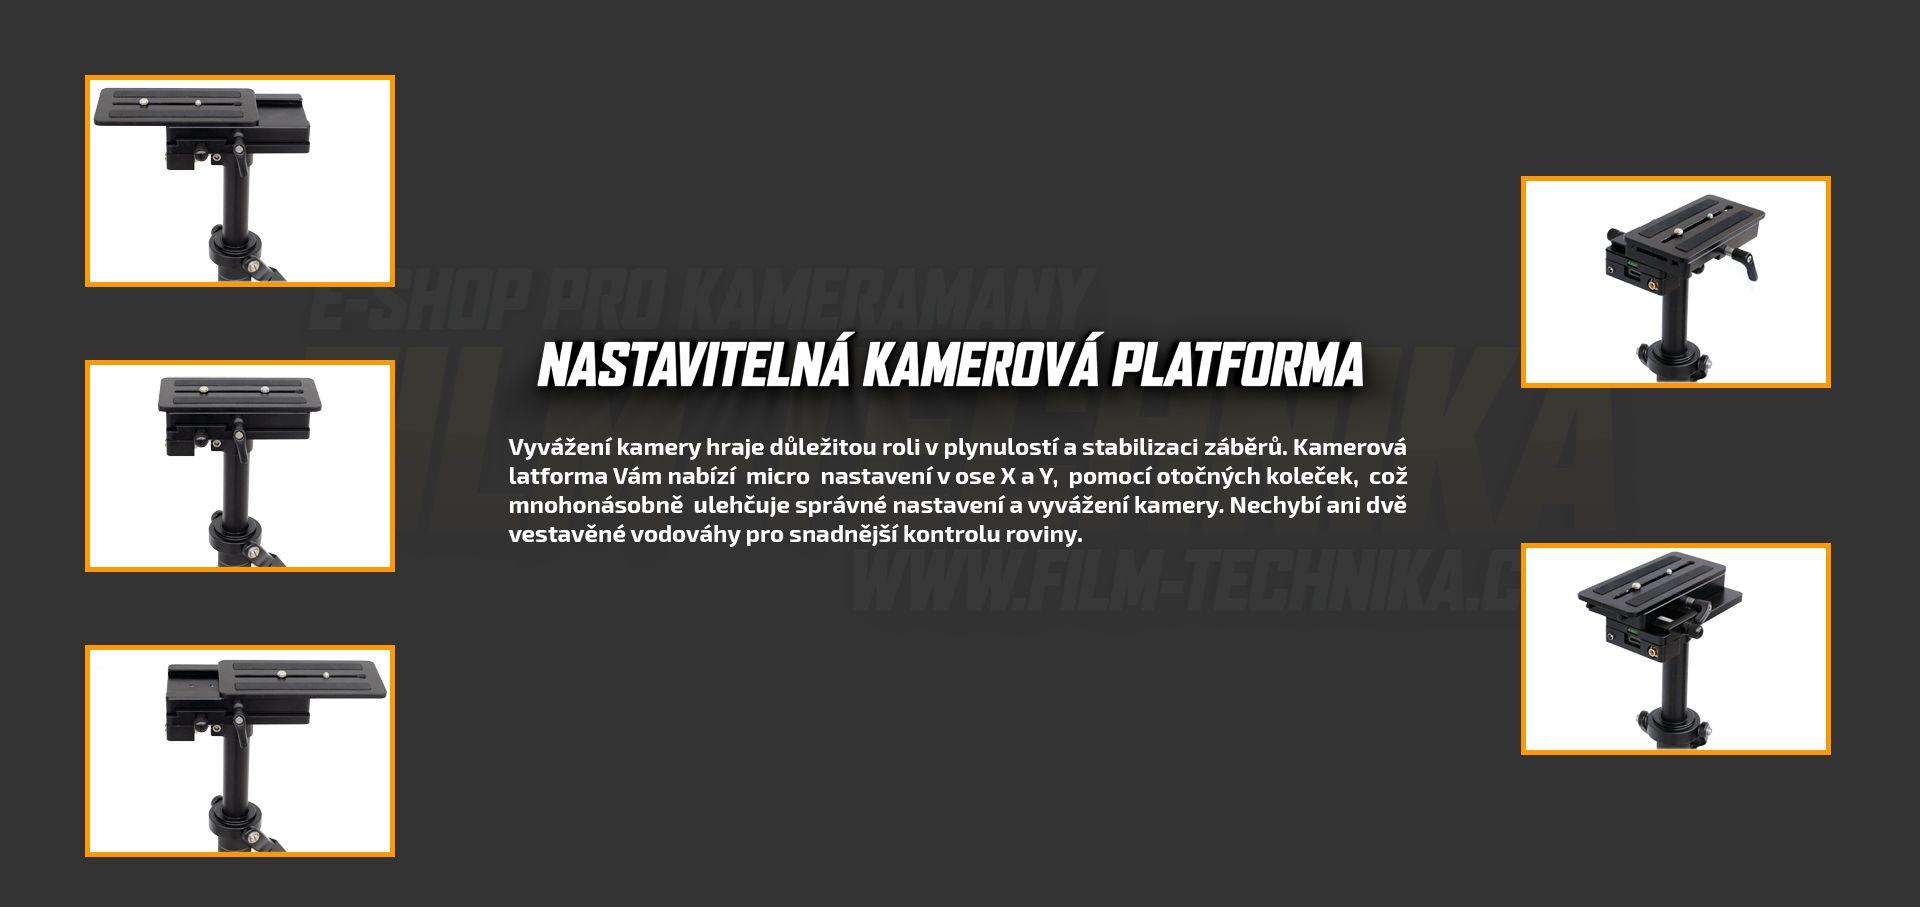 film-tehnika-proaim-zest-vista-ii-intext3